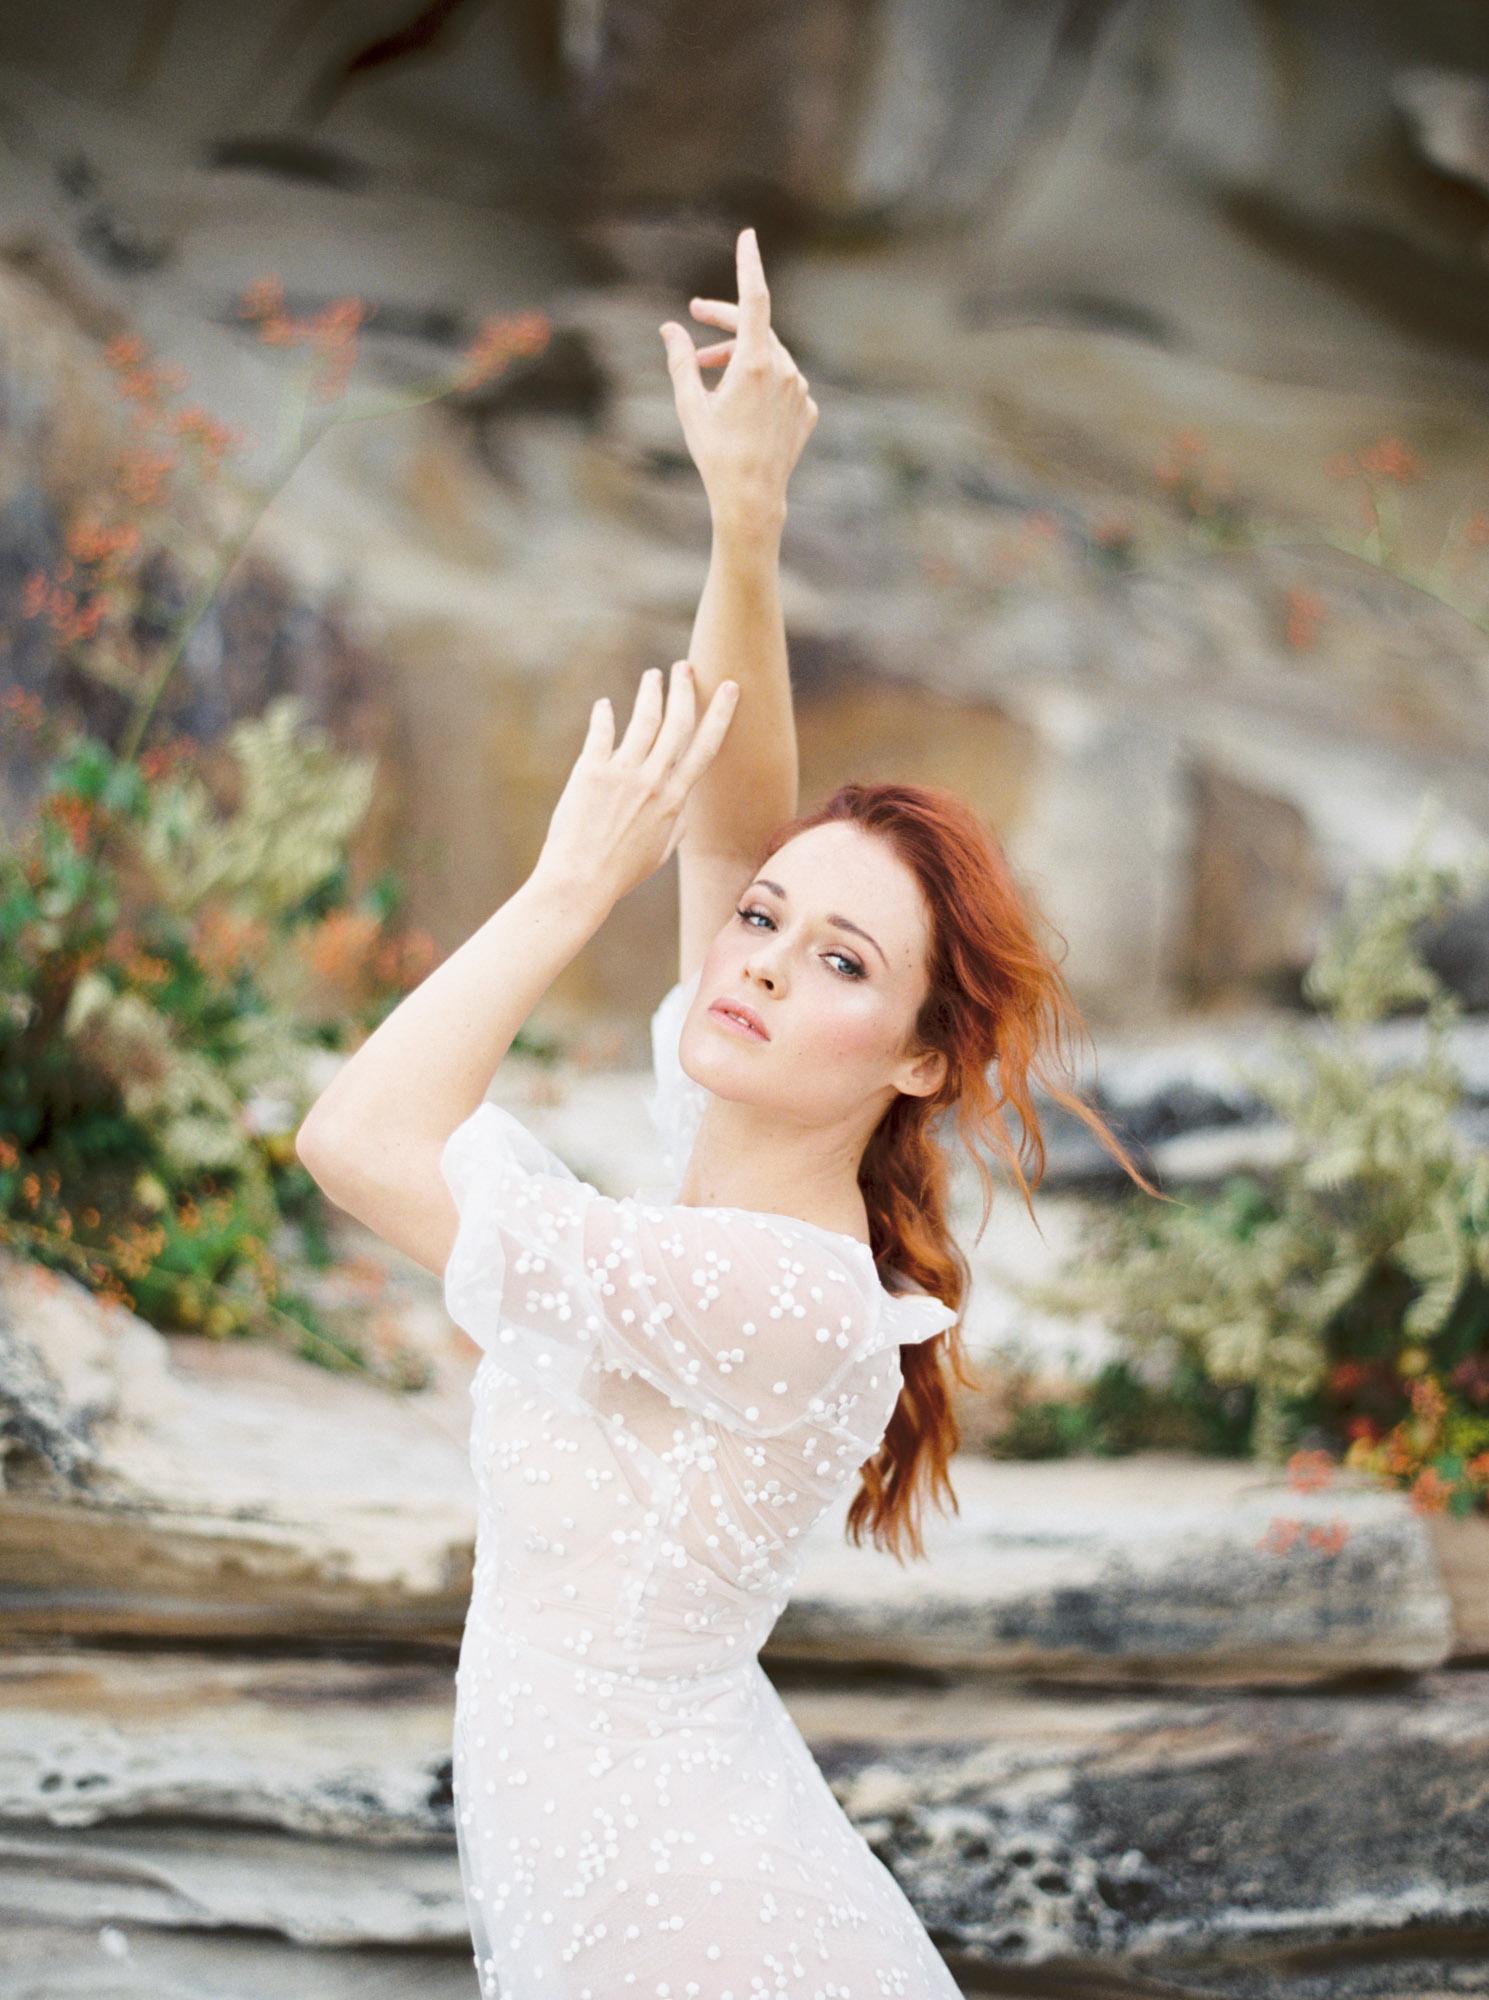 00025- Fine Art Film Newcastle NSW Wedding Photographer Sheri McMahon.jpg